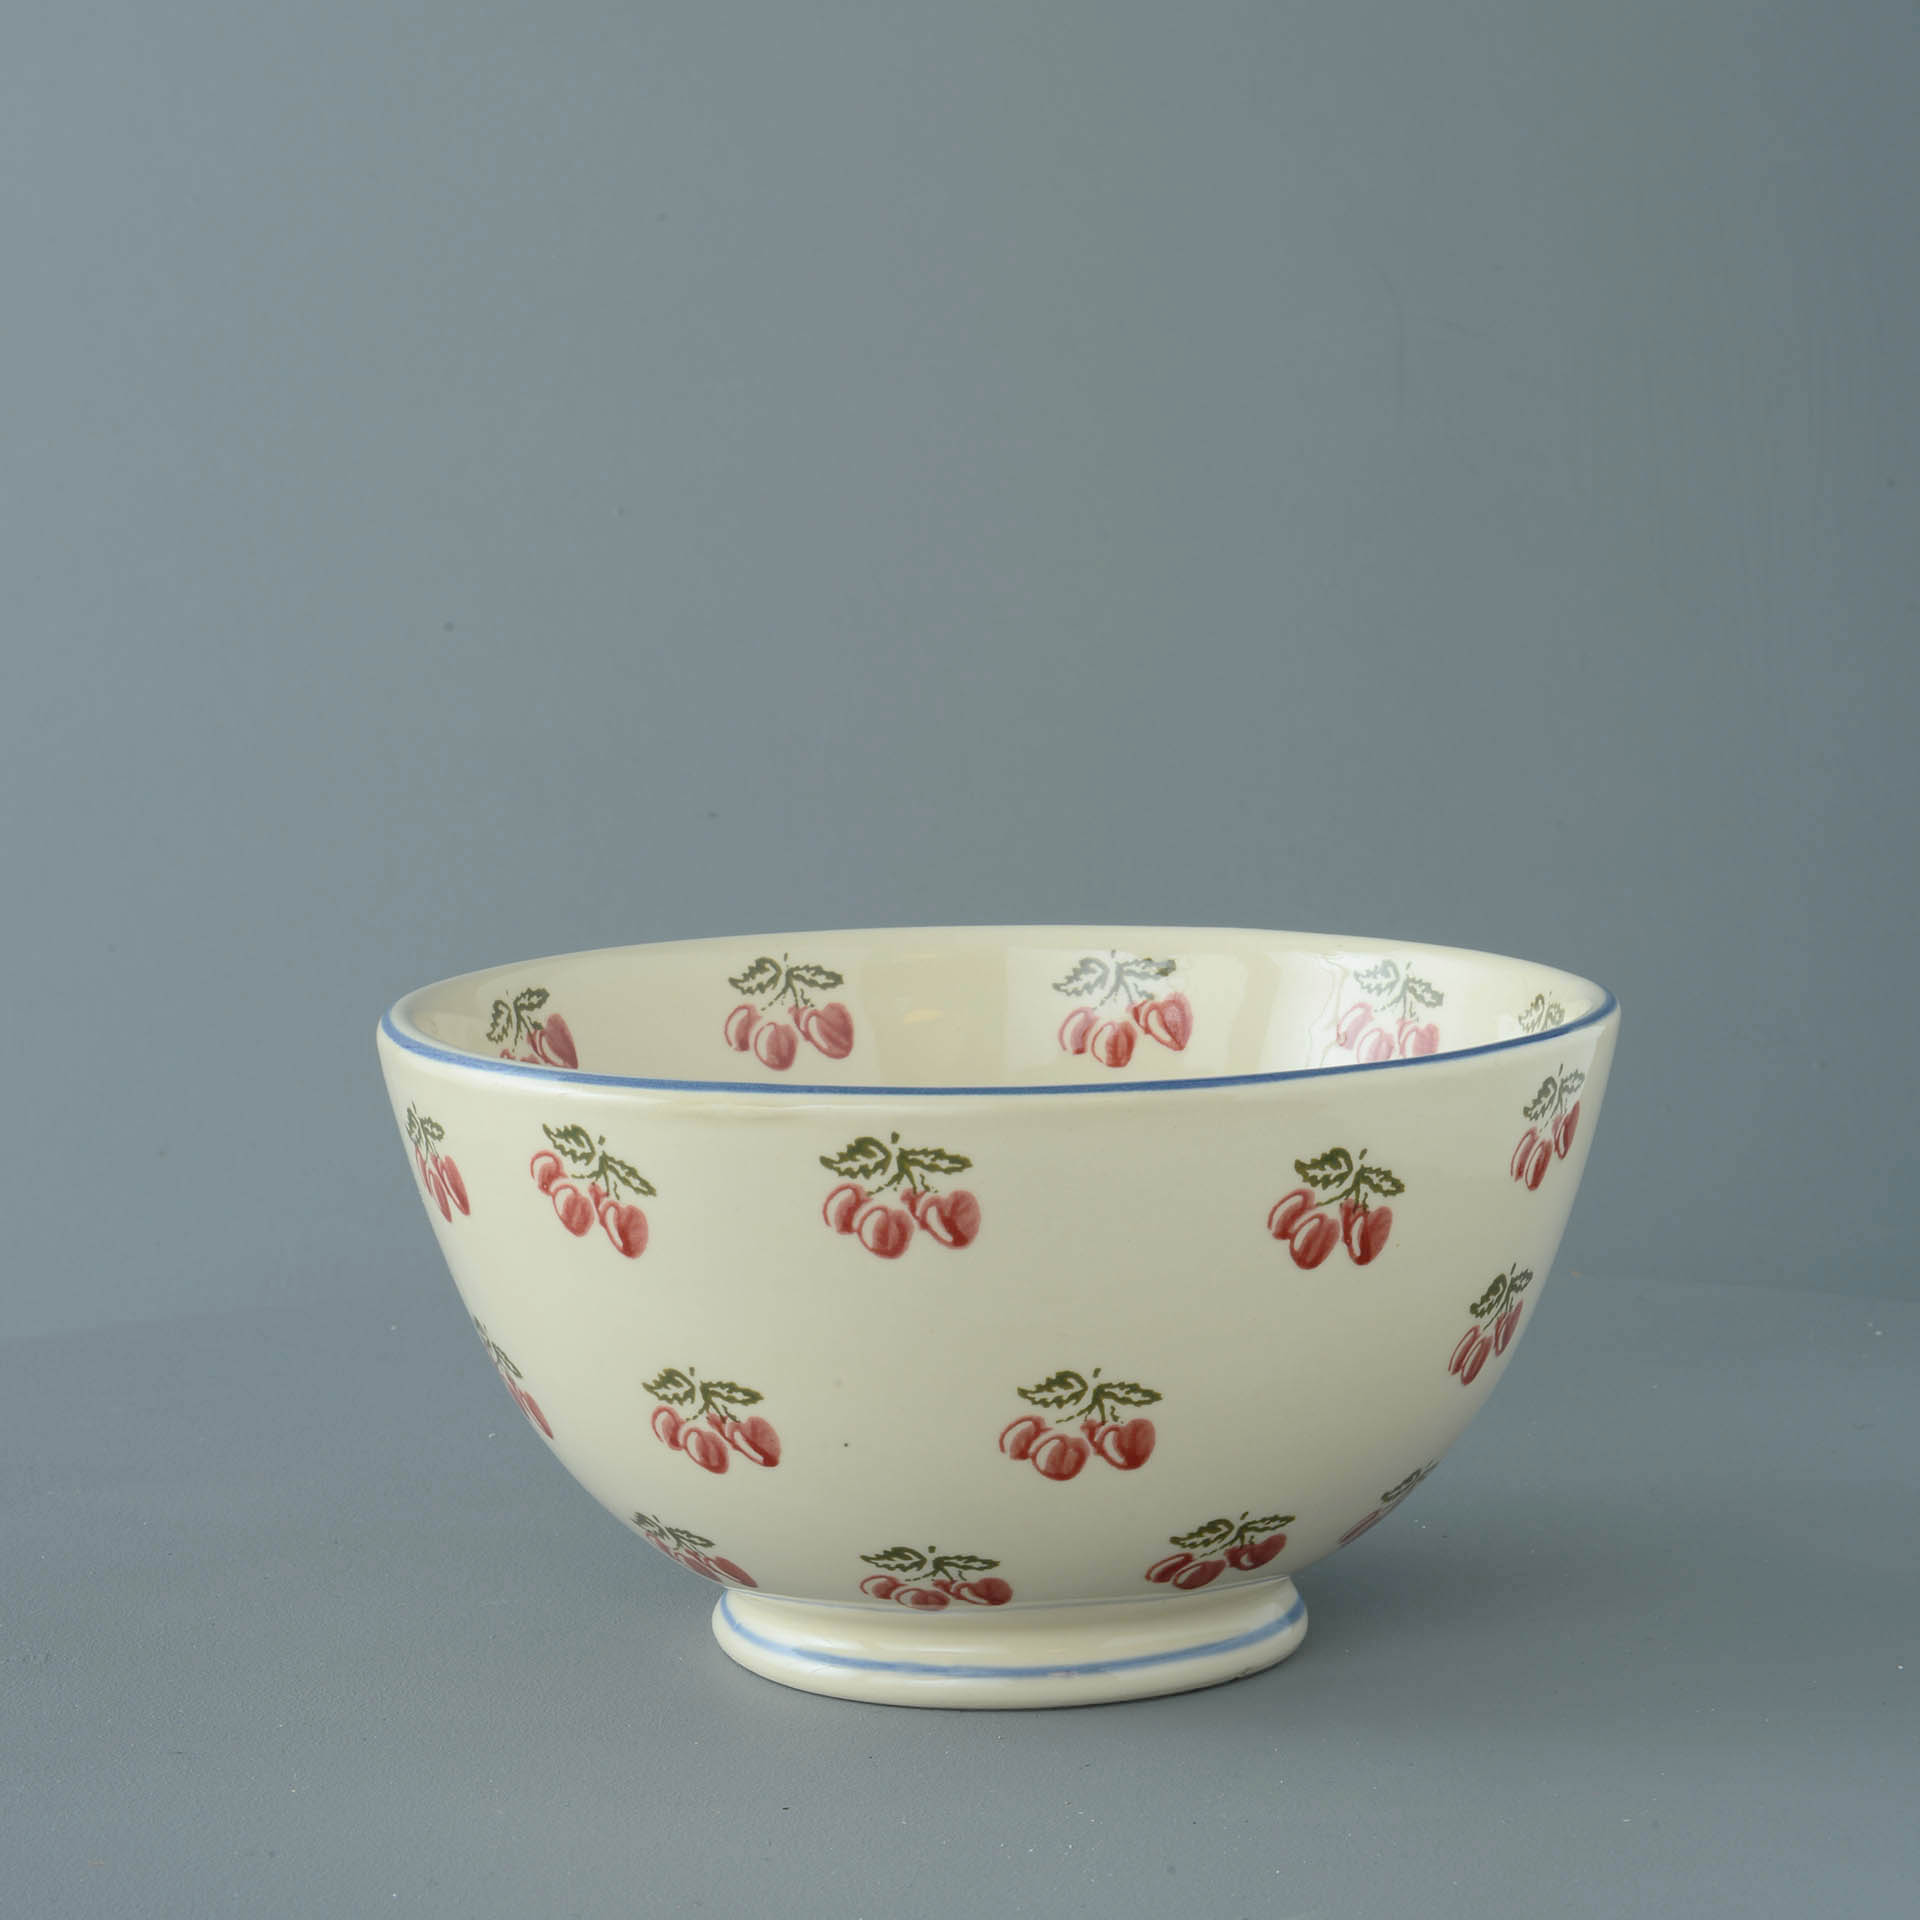 Cherries Serving Bowl 11 x 21.5cm